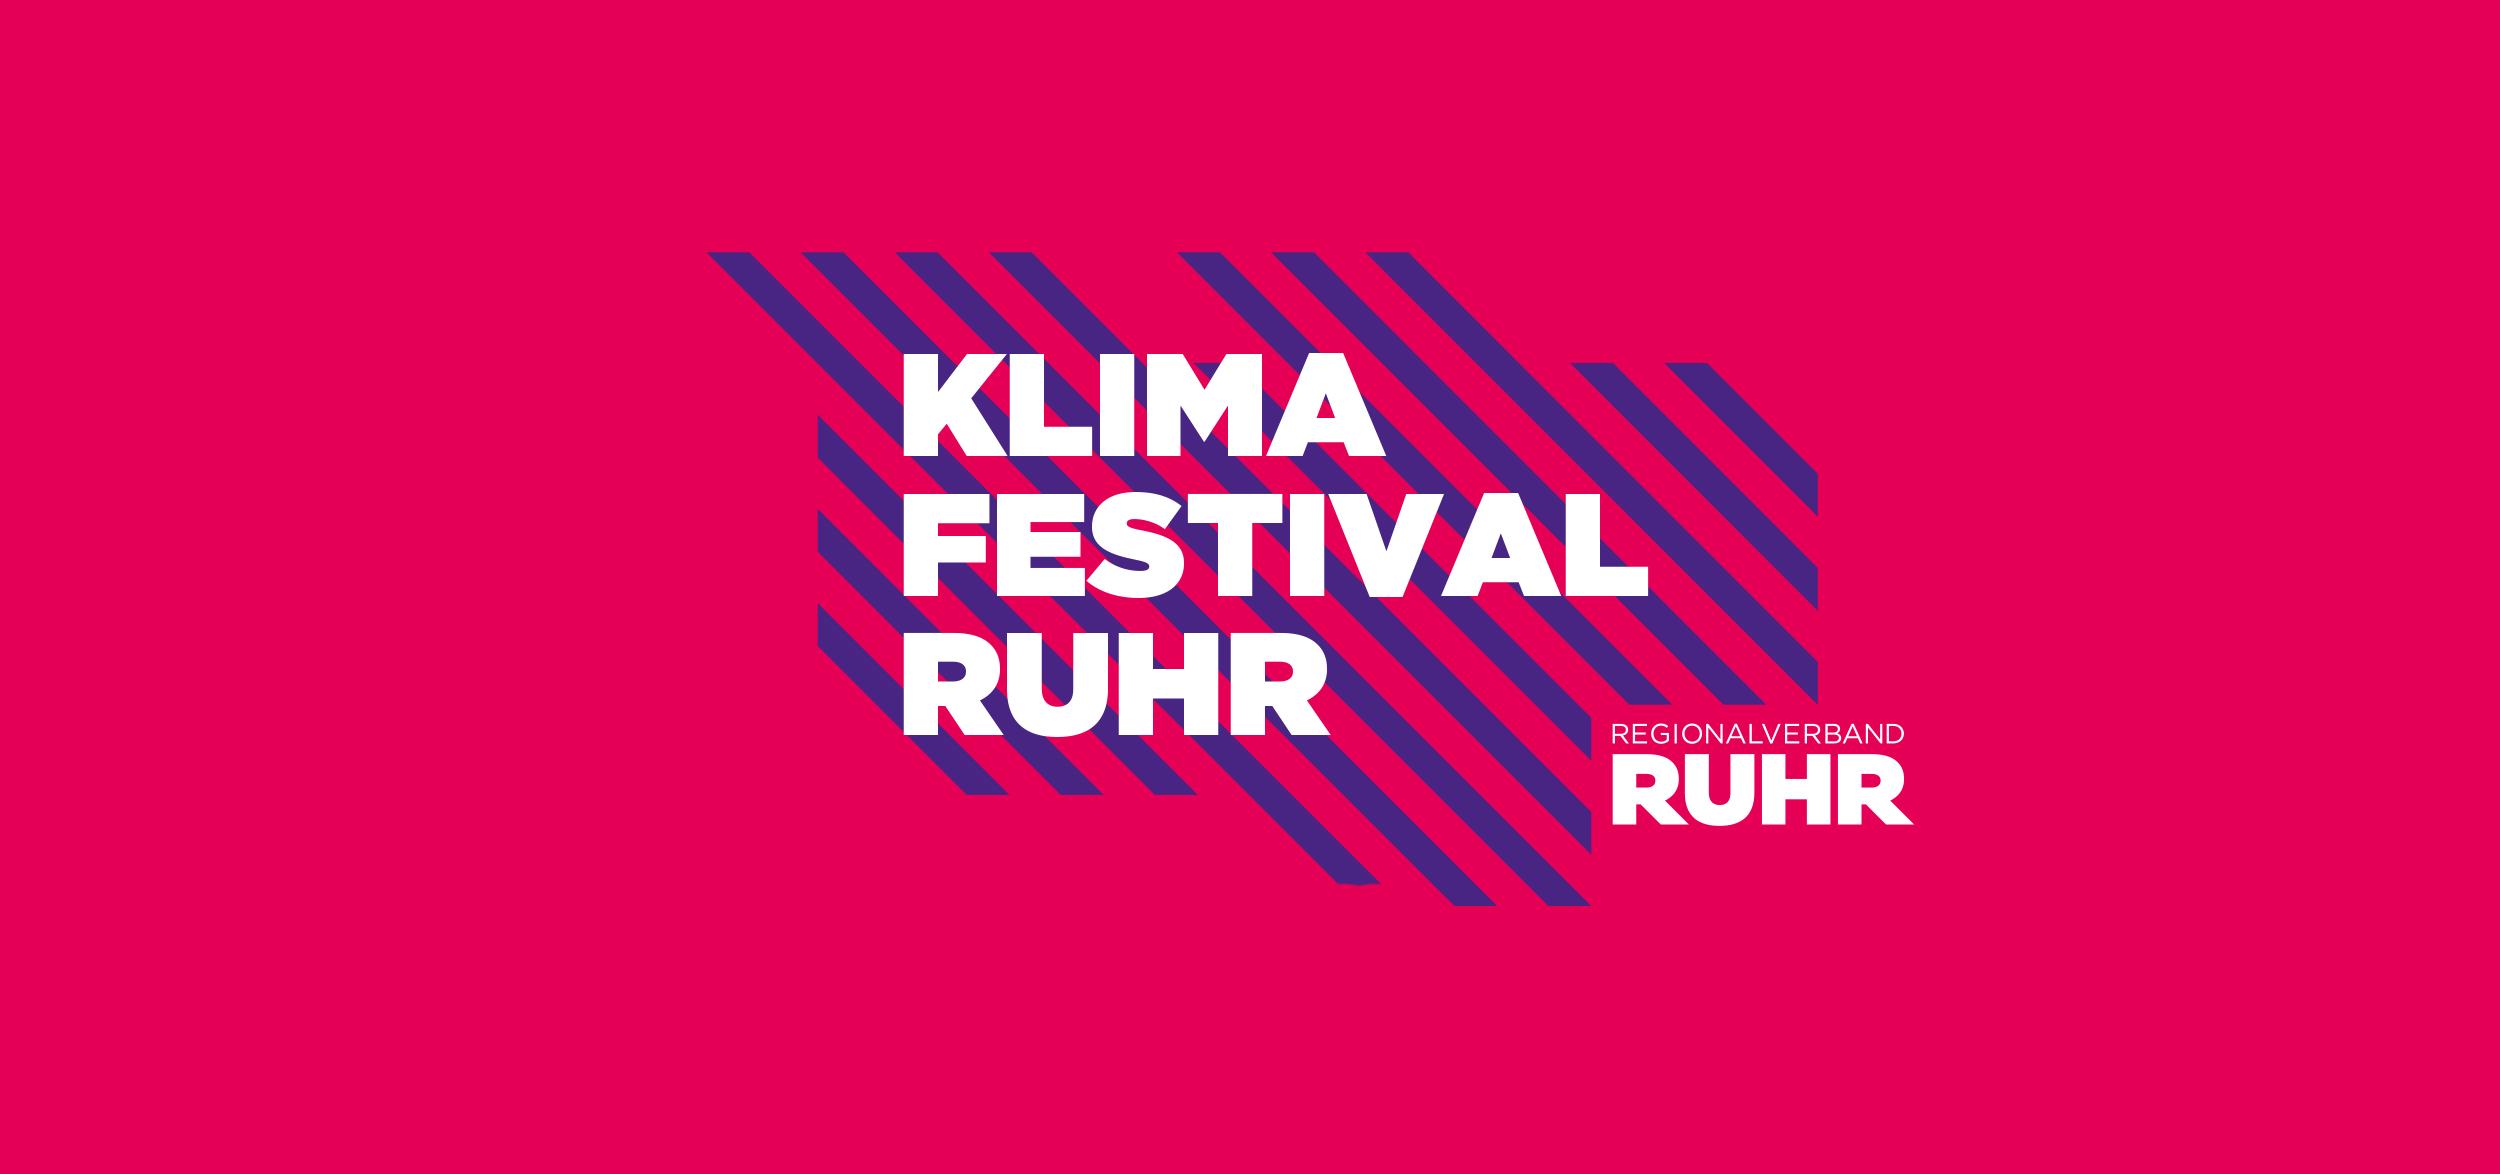 The Magnificent 7 | Klima Festival Ruhr 1